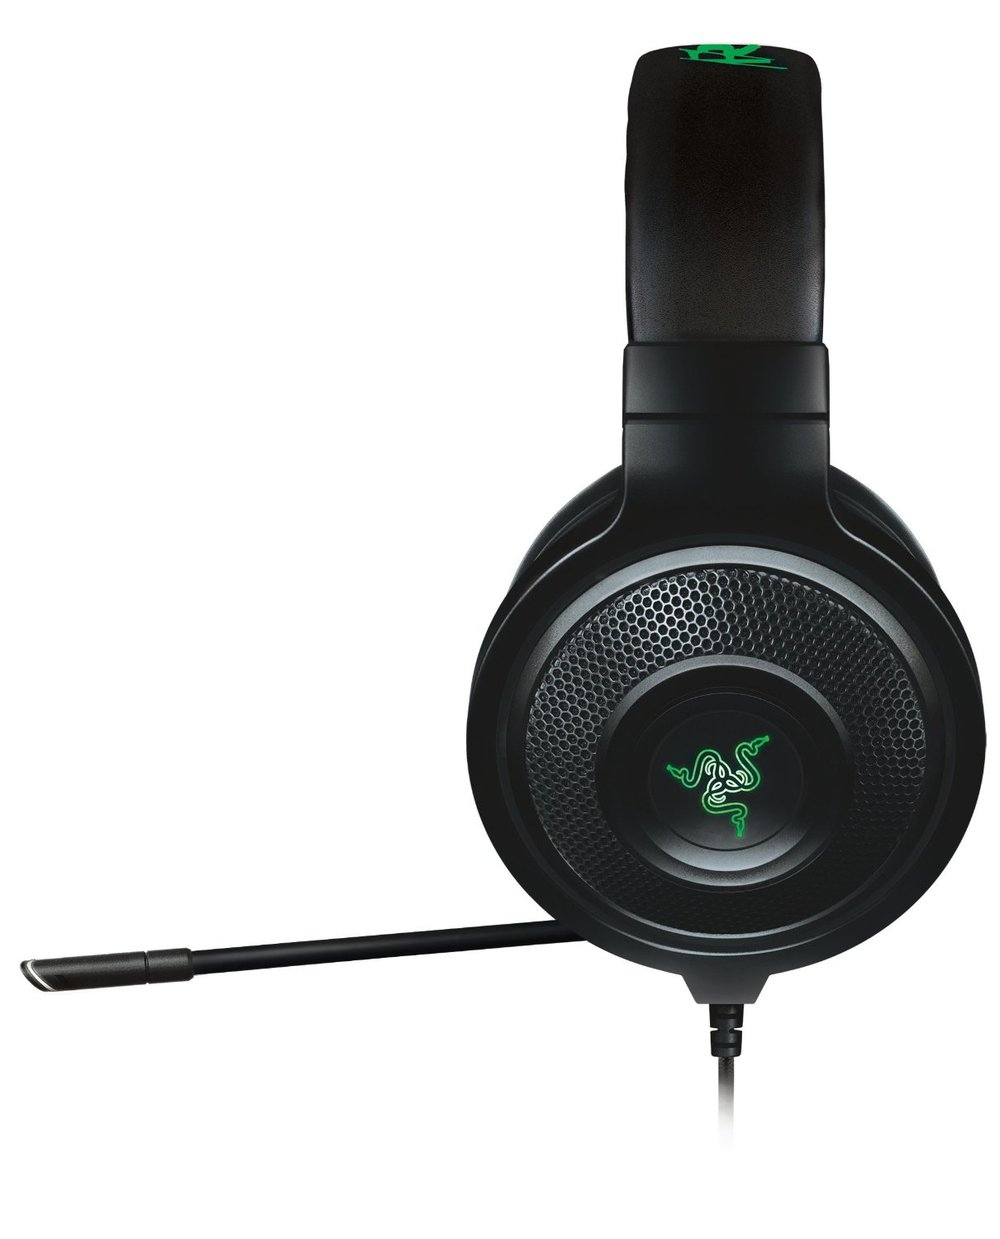 Razer Kraken Pro Gaming Headset6